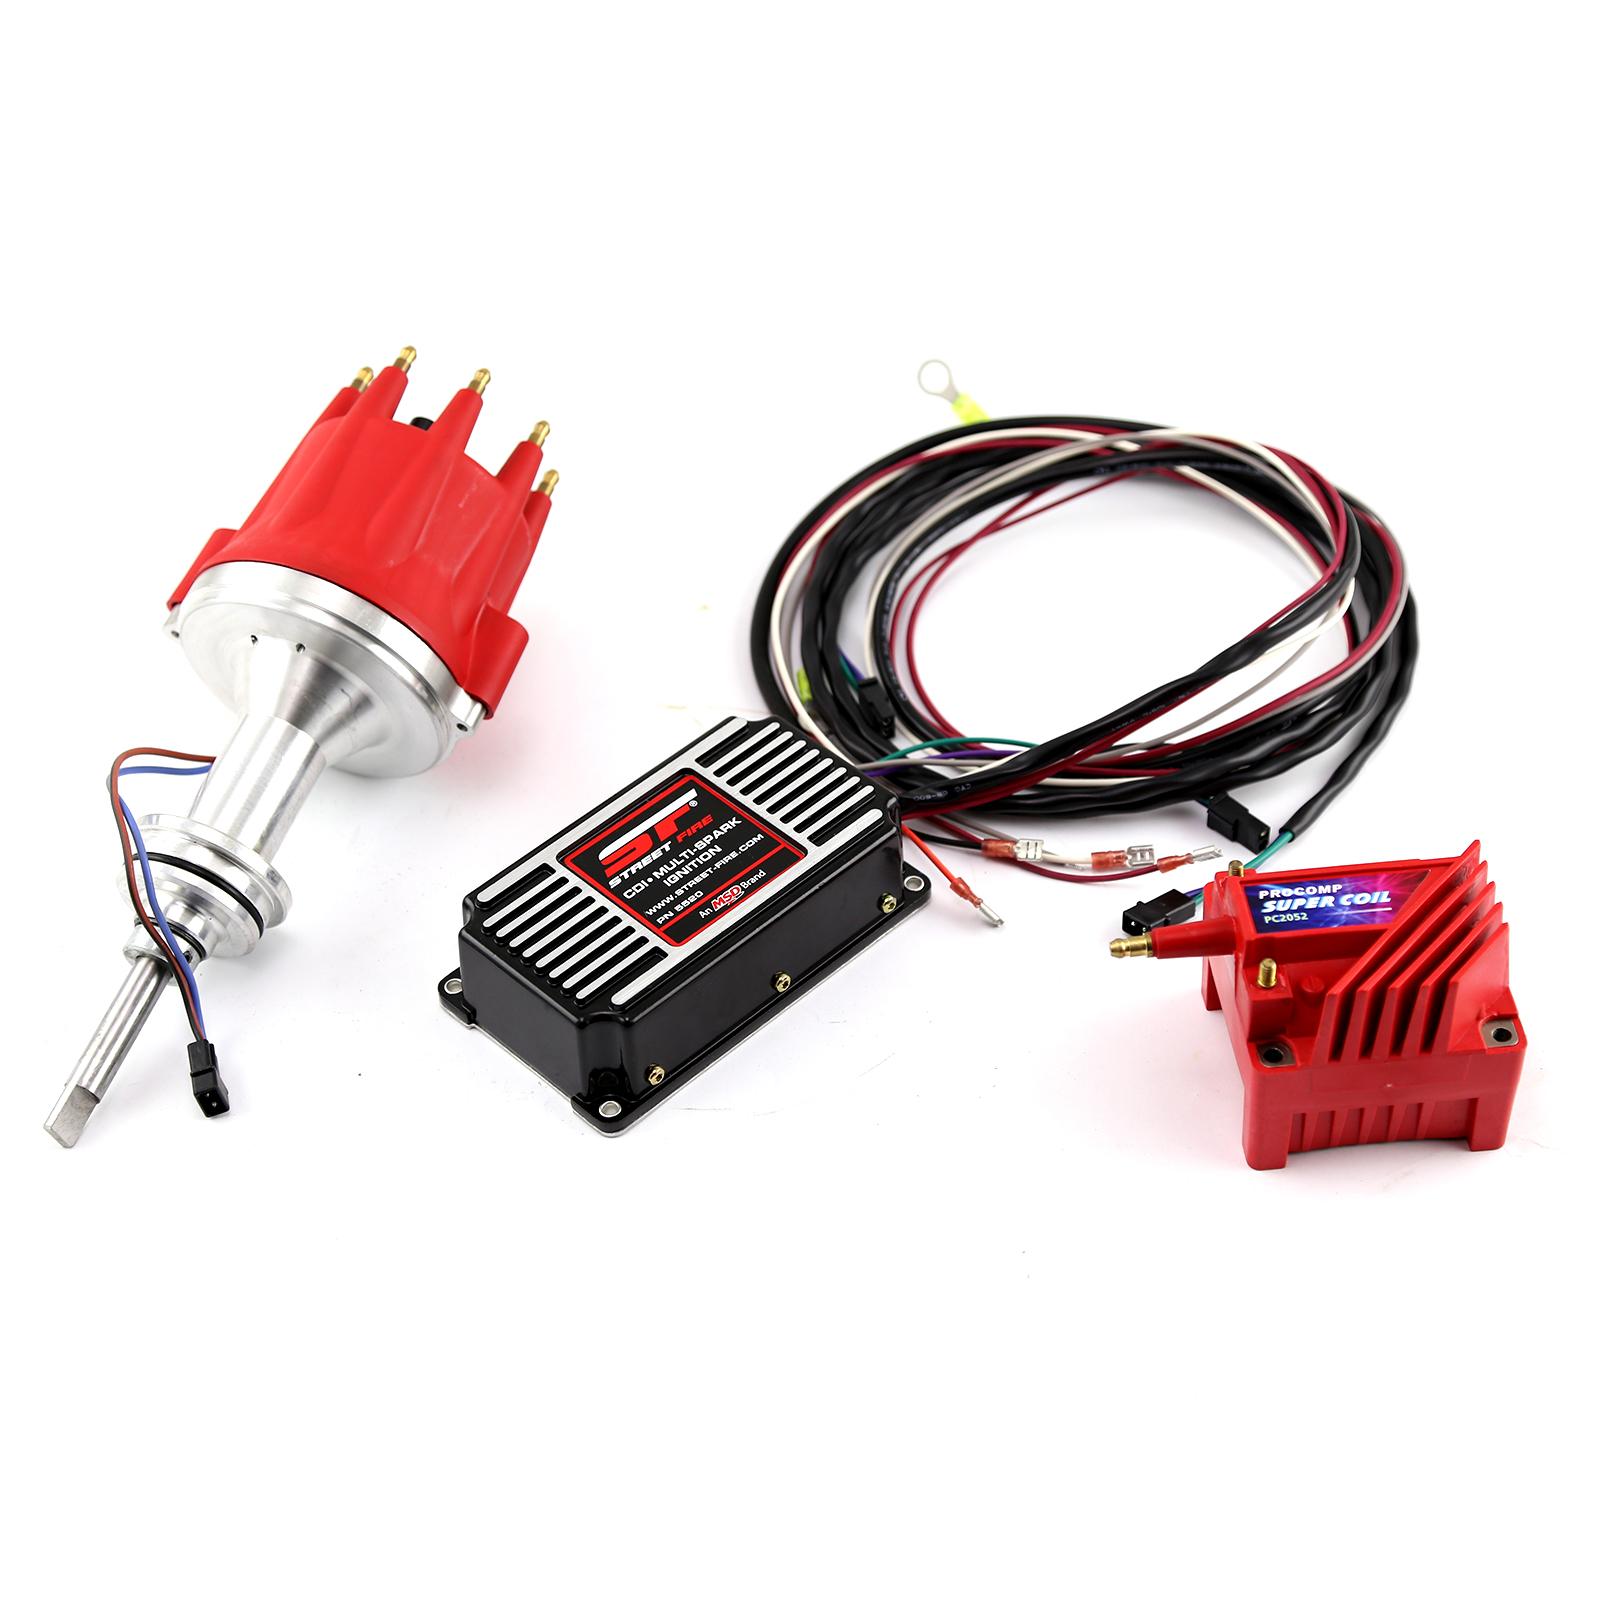 Mopar Chrysler BB 440 Pro Billet Distributor MSD CDI 5520 Ignition & Coil Kit